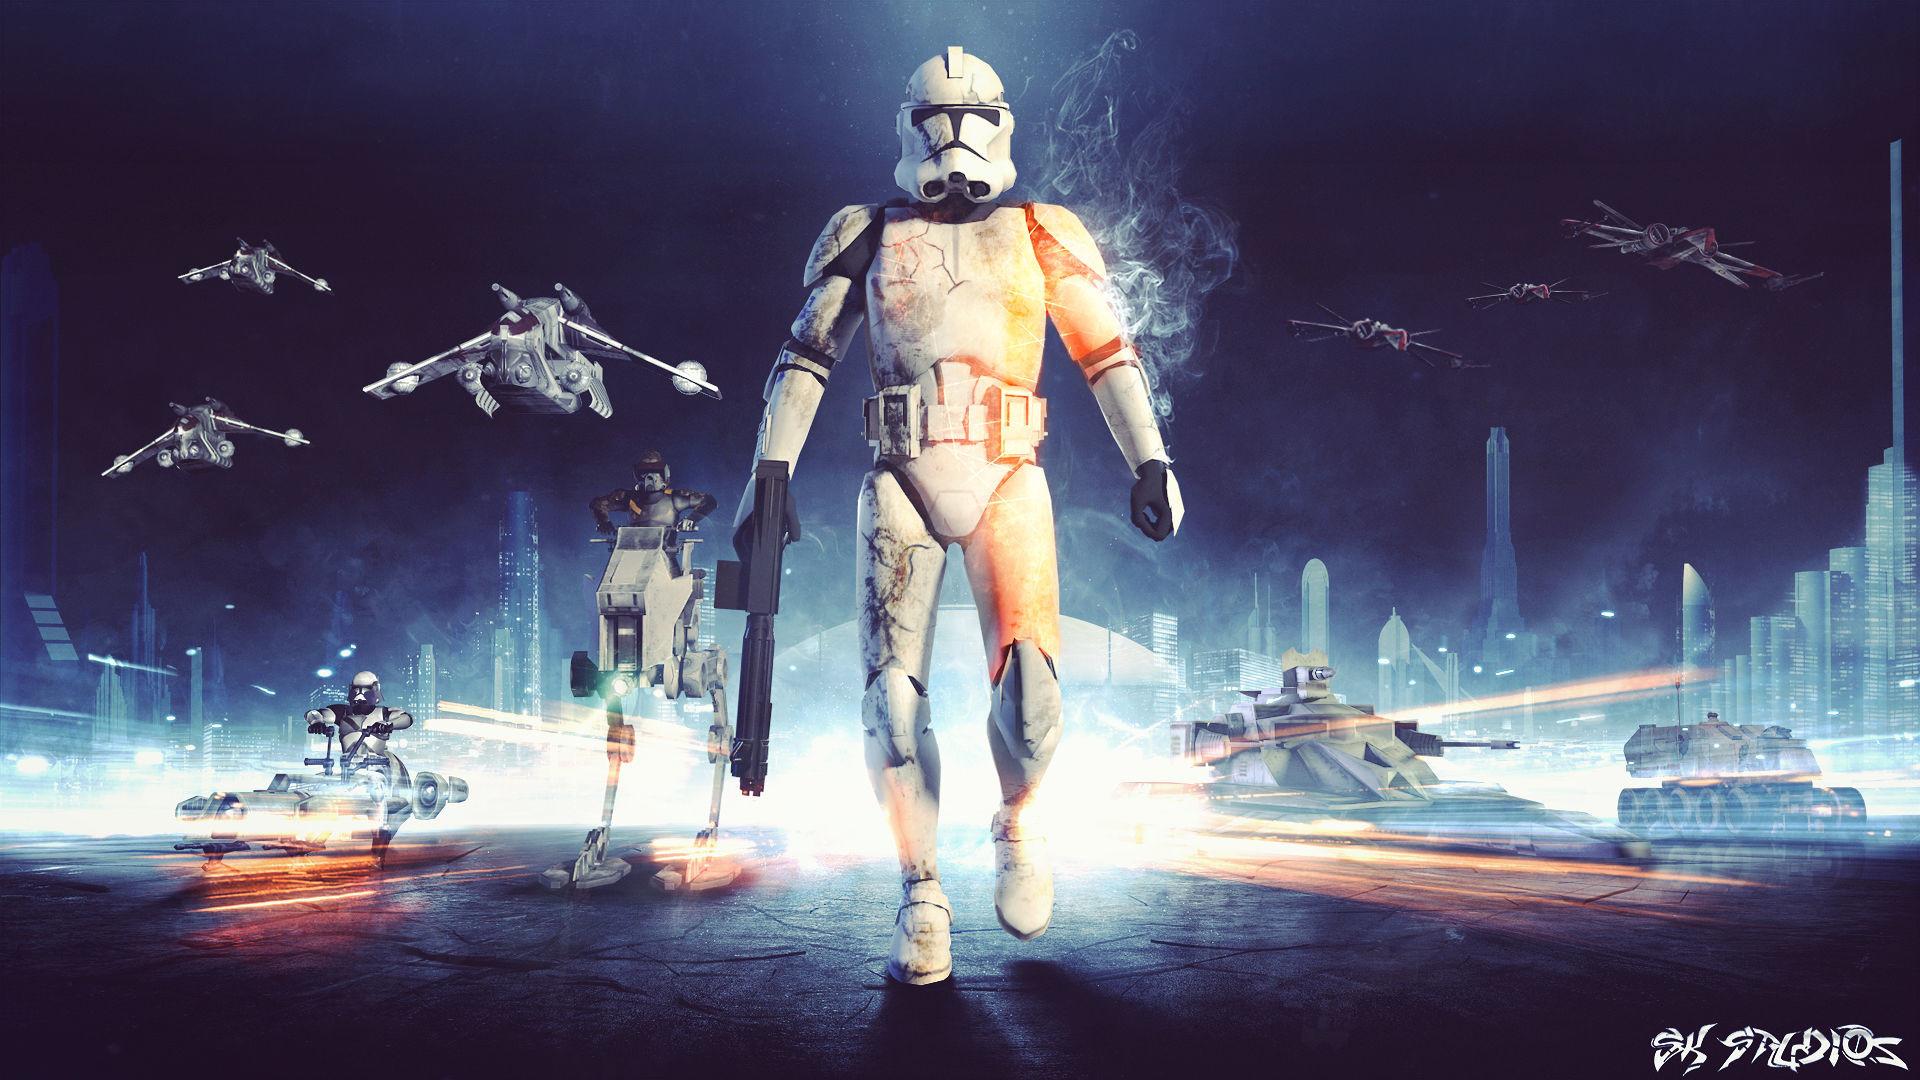 Star Wars Battlefront 3: SPOILERS Revealed By Episode 7 Concept Art?!